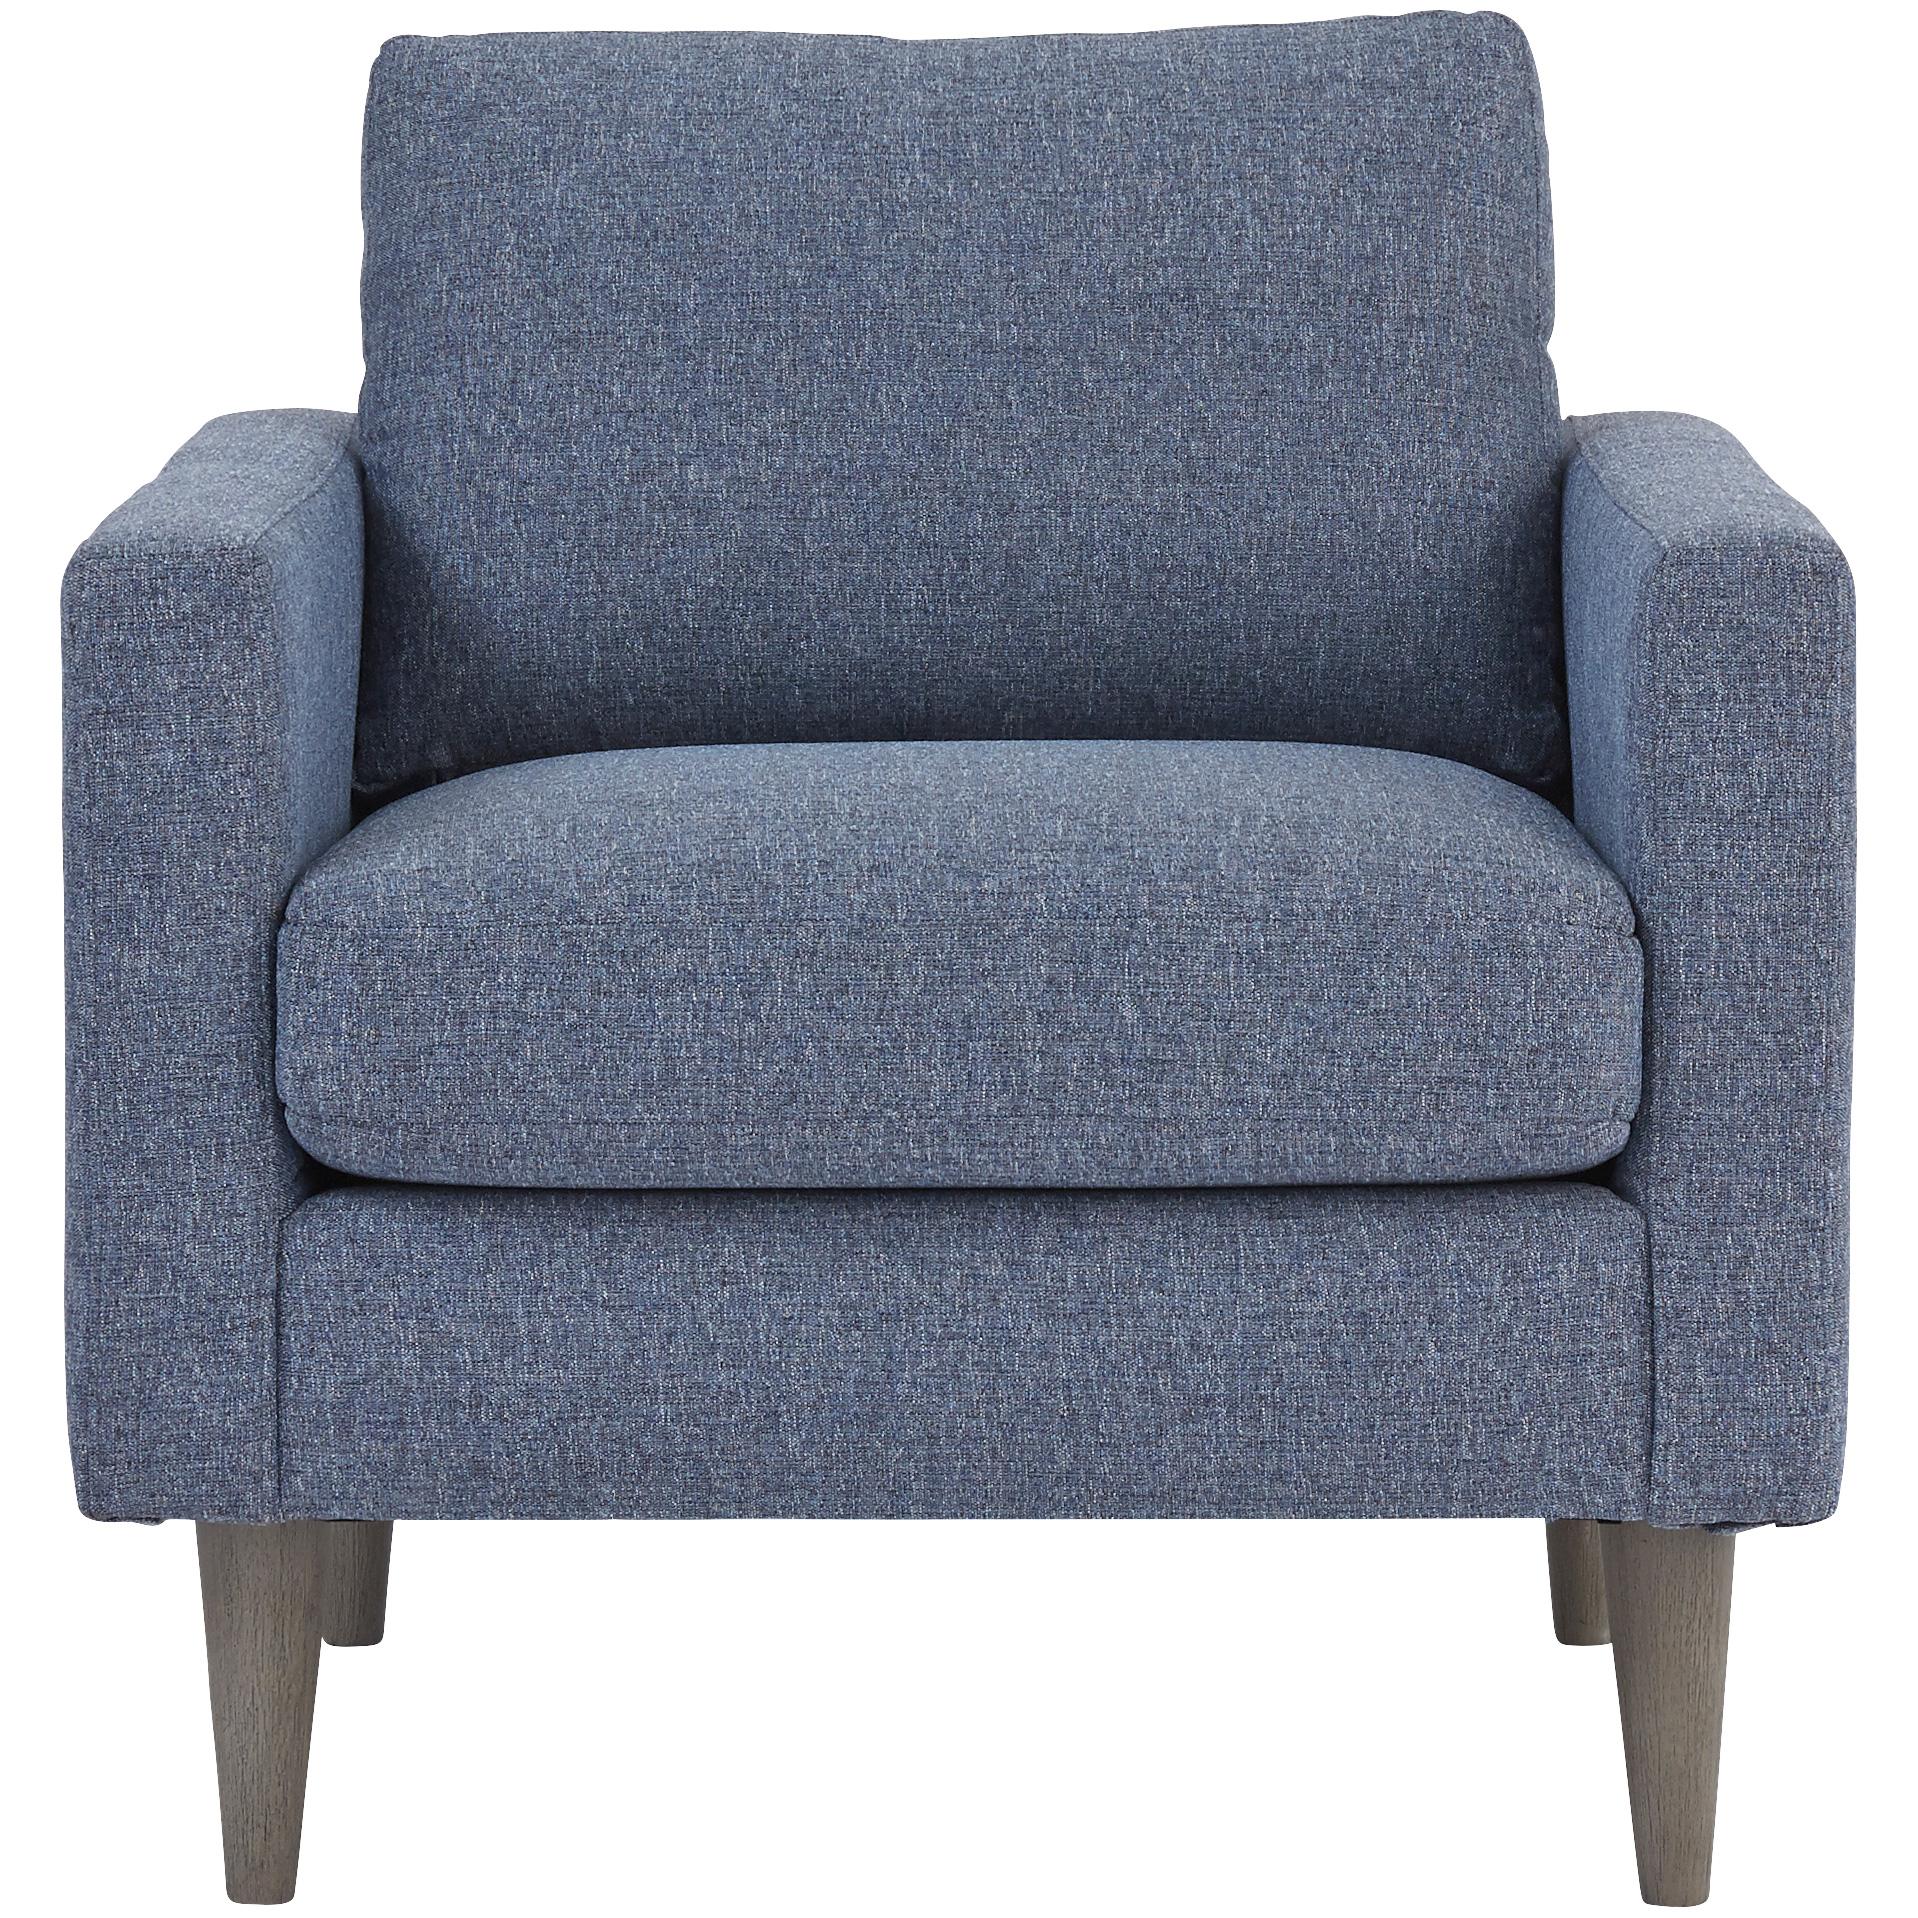 Best Home Furnishings | Trafton Denim Chair